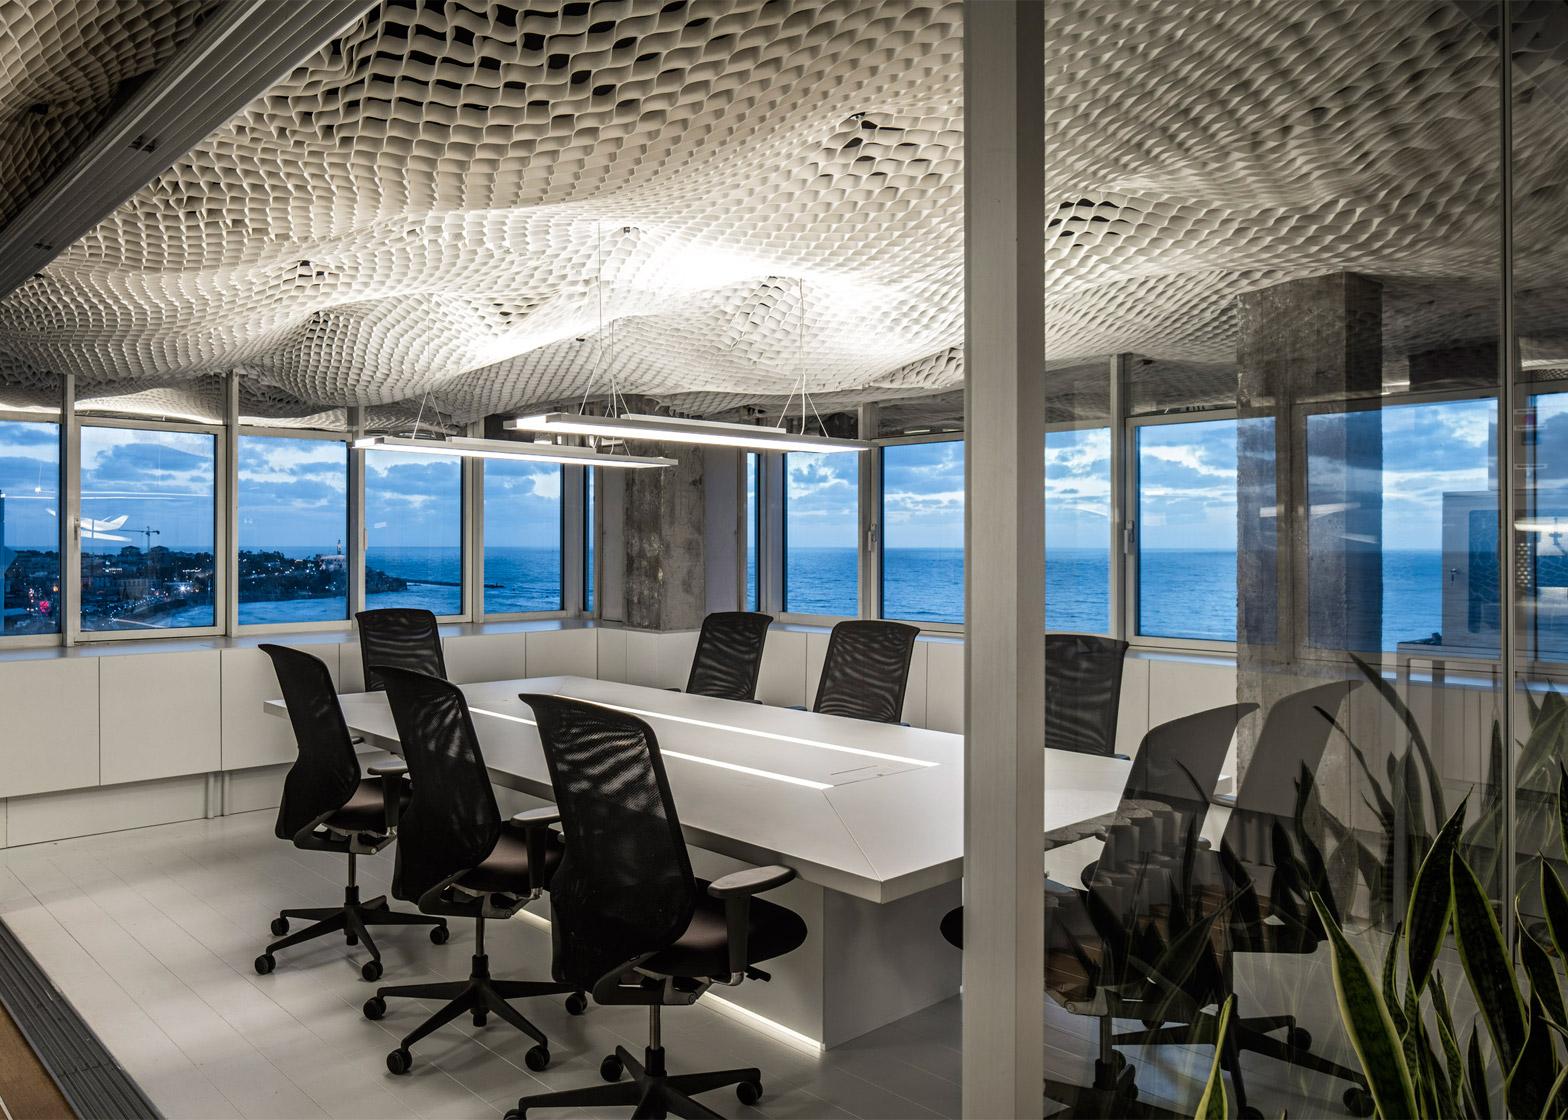 prs-offices-paritzki-liani-architects-interiors-ceiling-geo-cell-tel-aviv-israel-colour_dezeen_1568_3